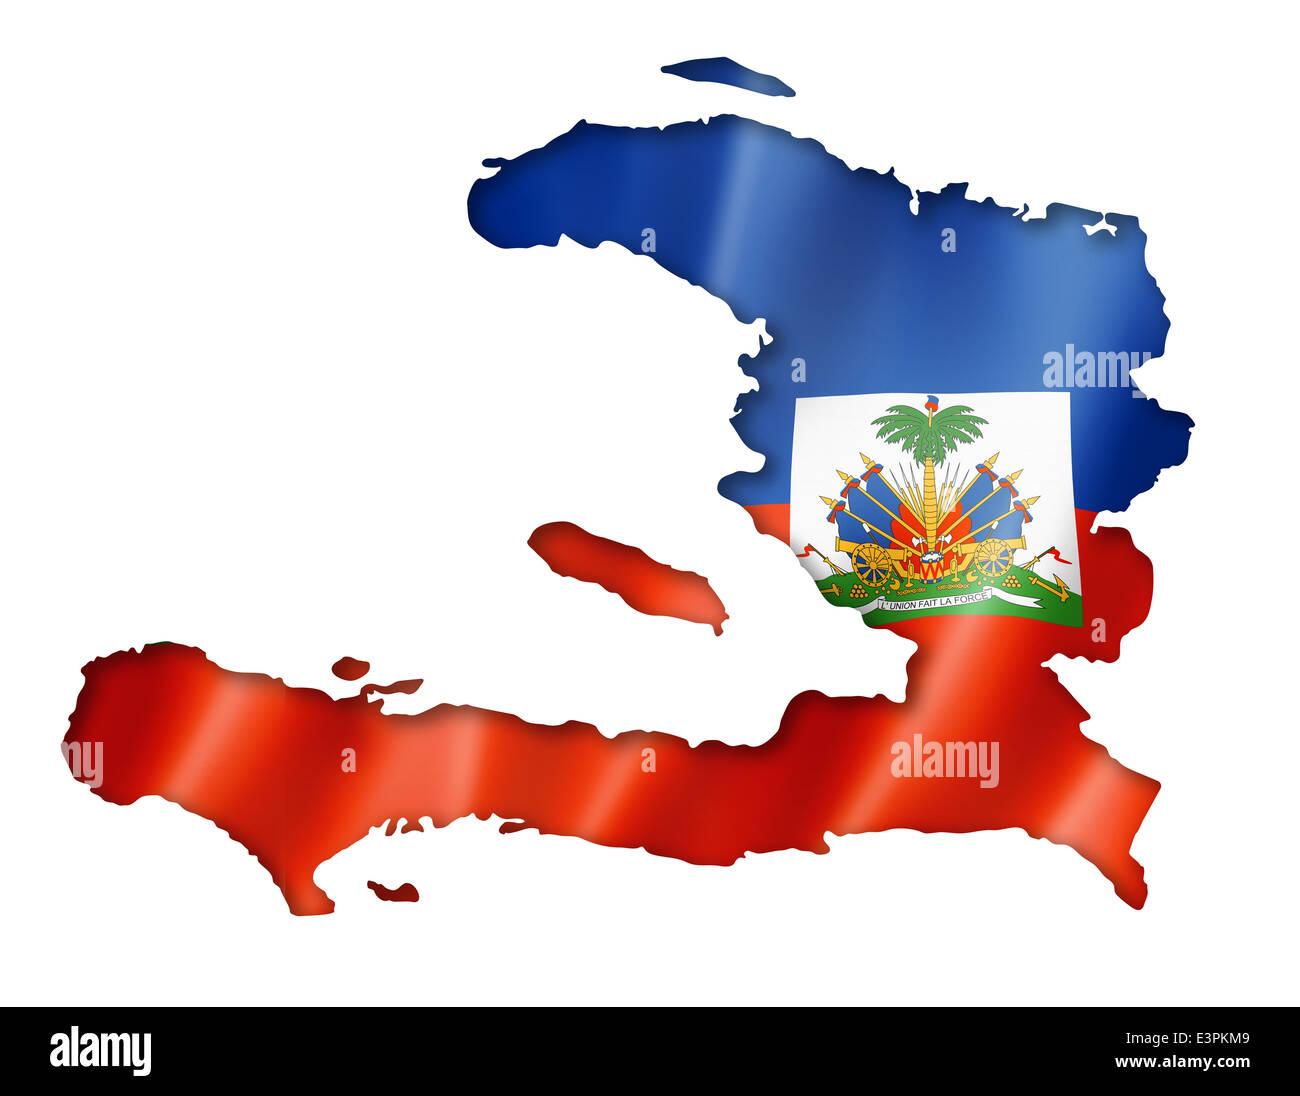 Haiti Map Imágenes De Stock & Haiti Map Fotos De Stock - Alamy